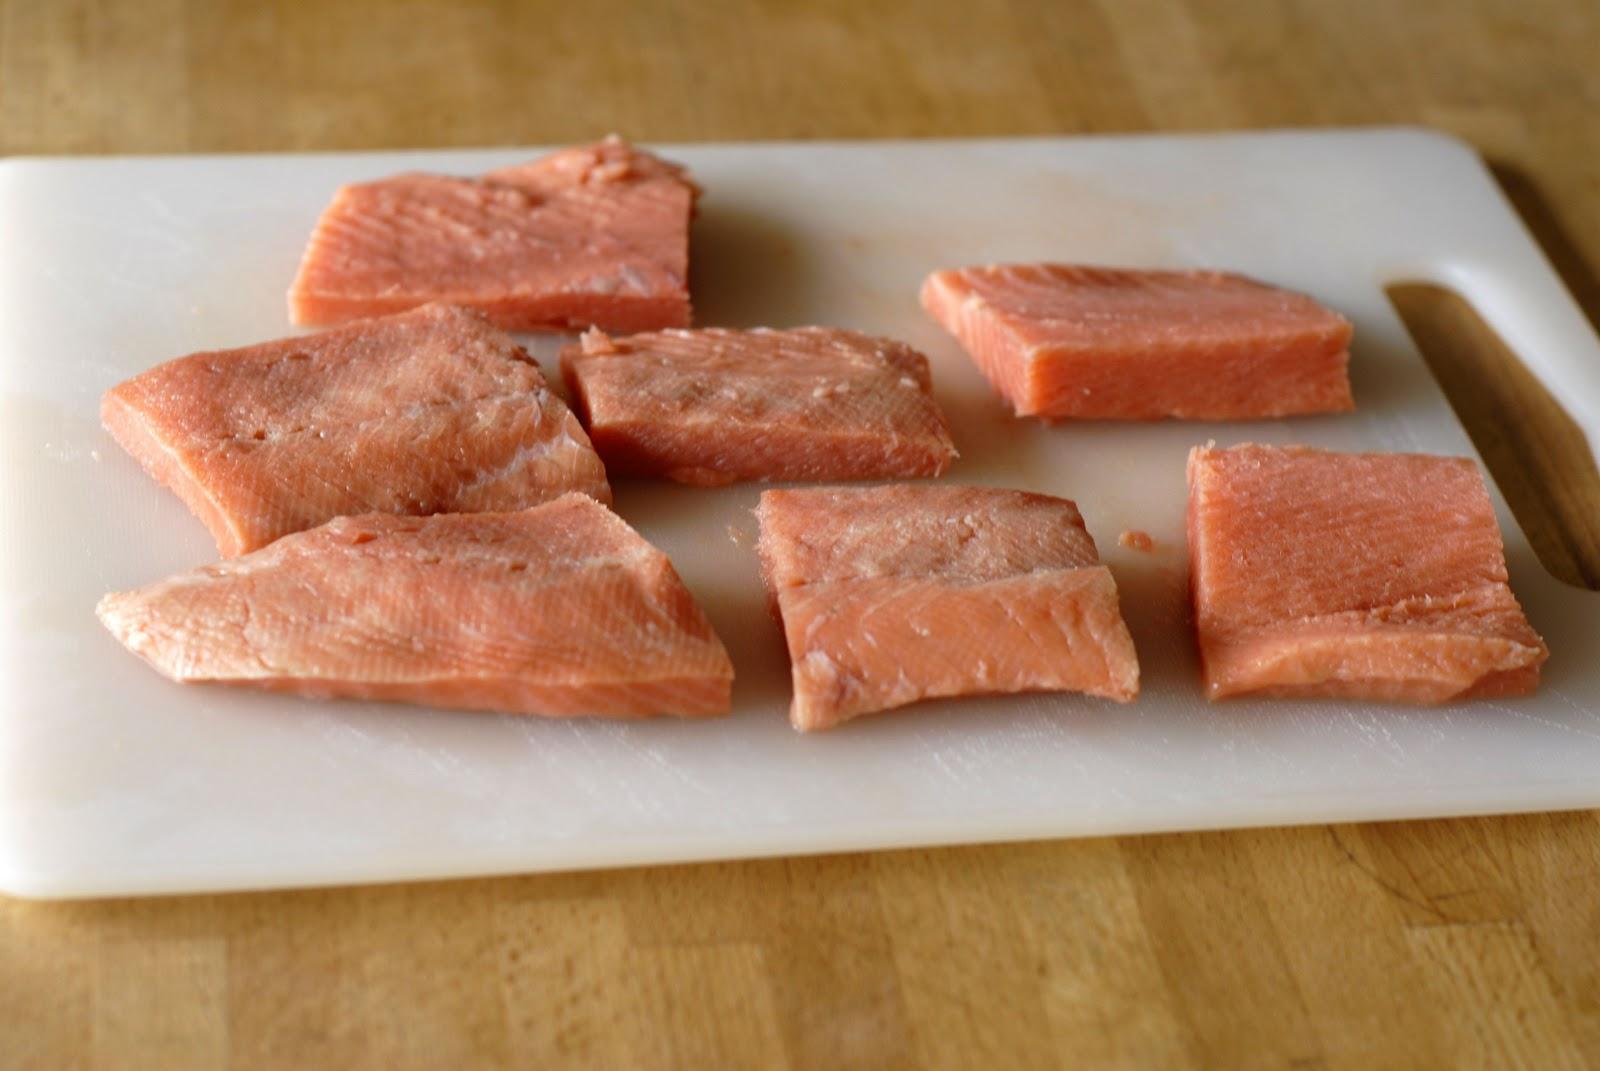 http://4.bp.blogspot.com/-SBSJmYO2DPs/TwvZ3LvvNiI/AAAAAAAABKk/V95bXepb-lY/s1600/salmon.JPG